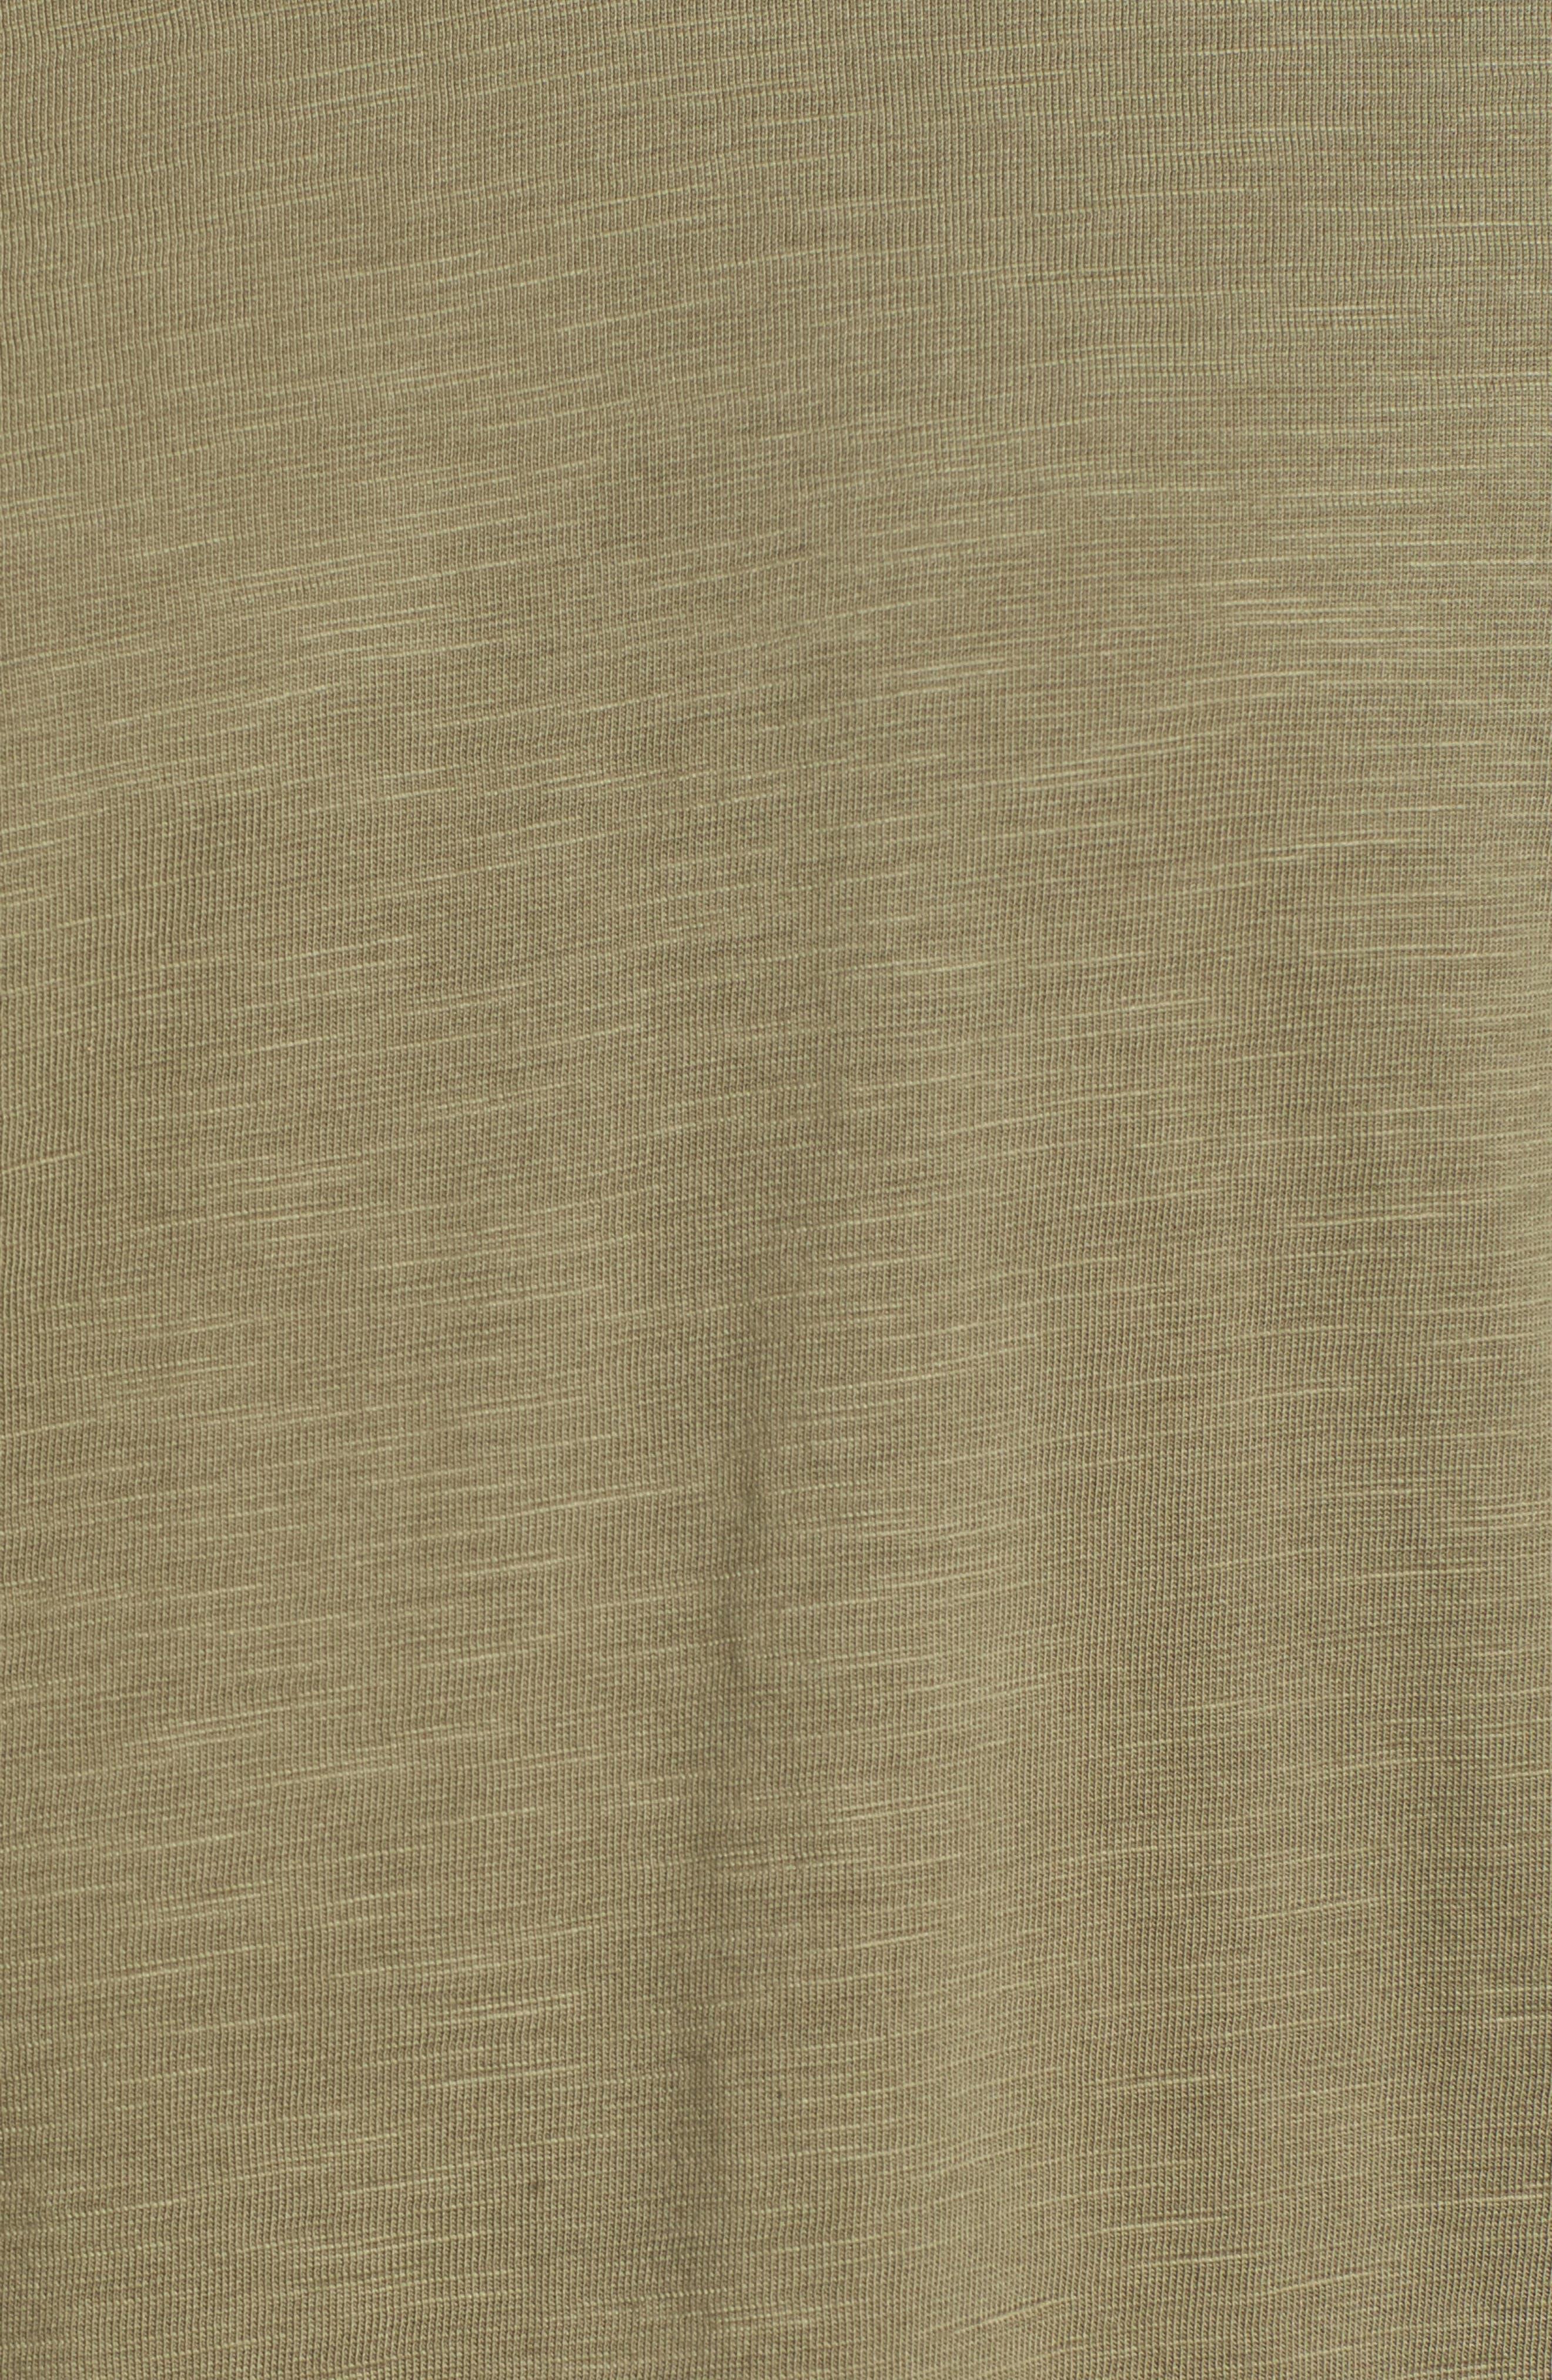 Portside Palms V-Neck T-Shirt,                             Alternate thumbnail 40, color,